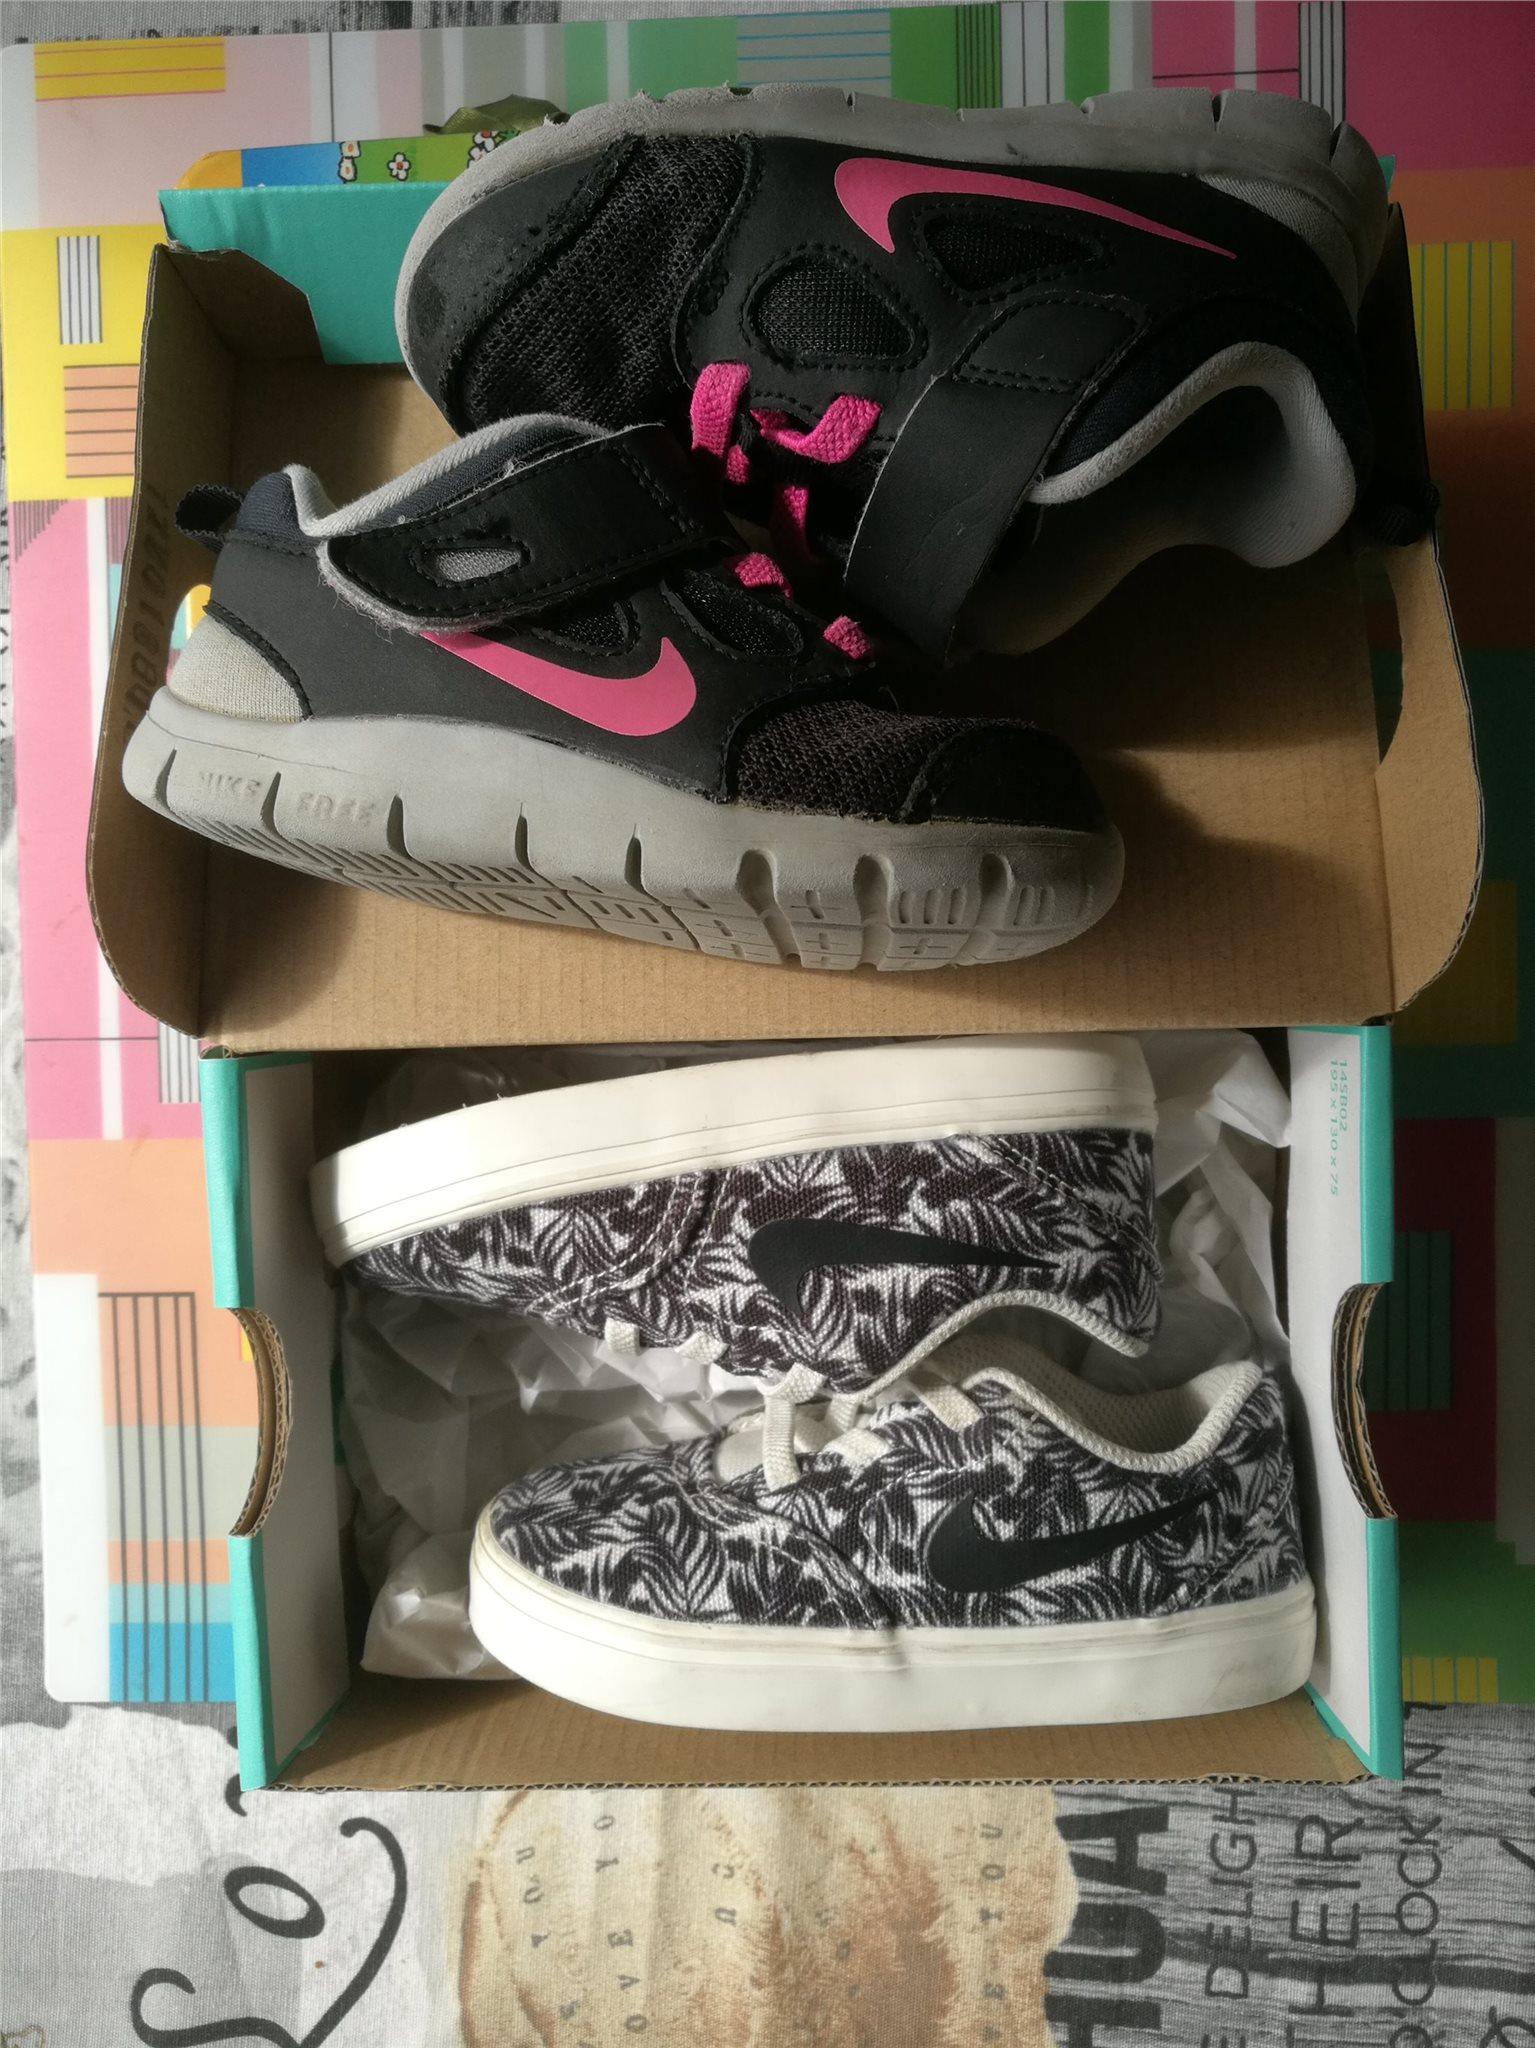 sale retailer 48a49 eb259 Två par NIKE skor. Storlek 23,5 (ca 13 cm).